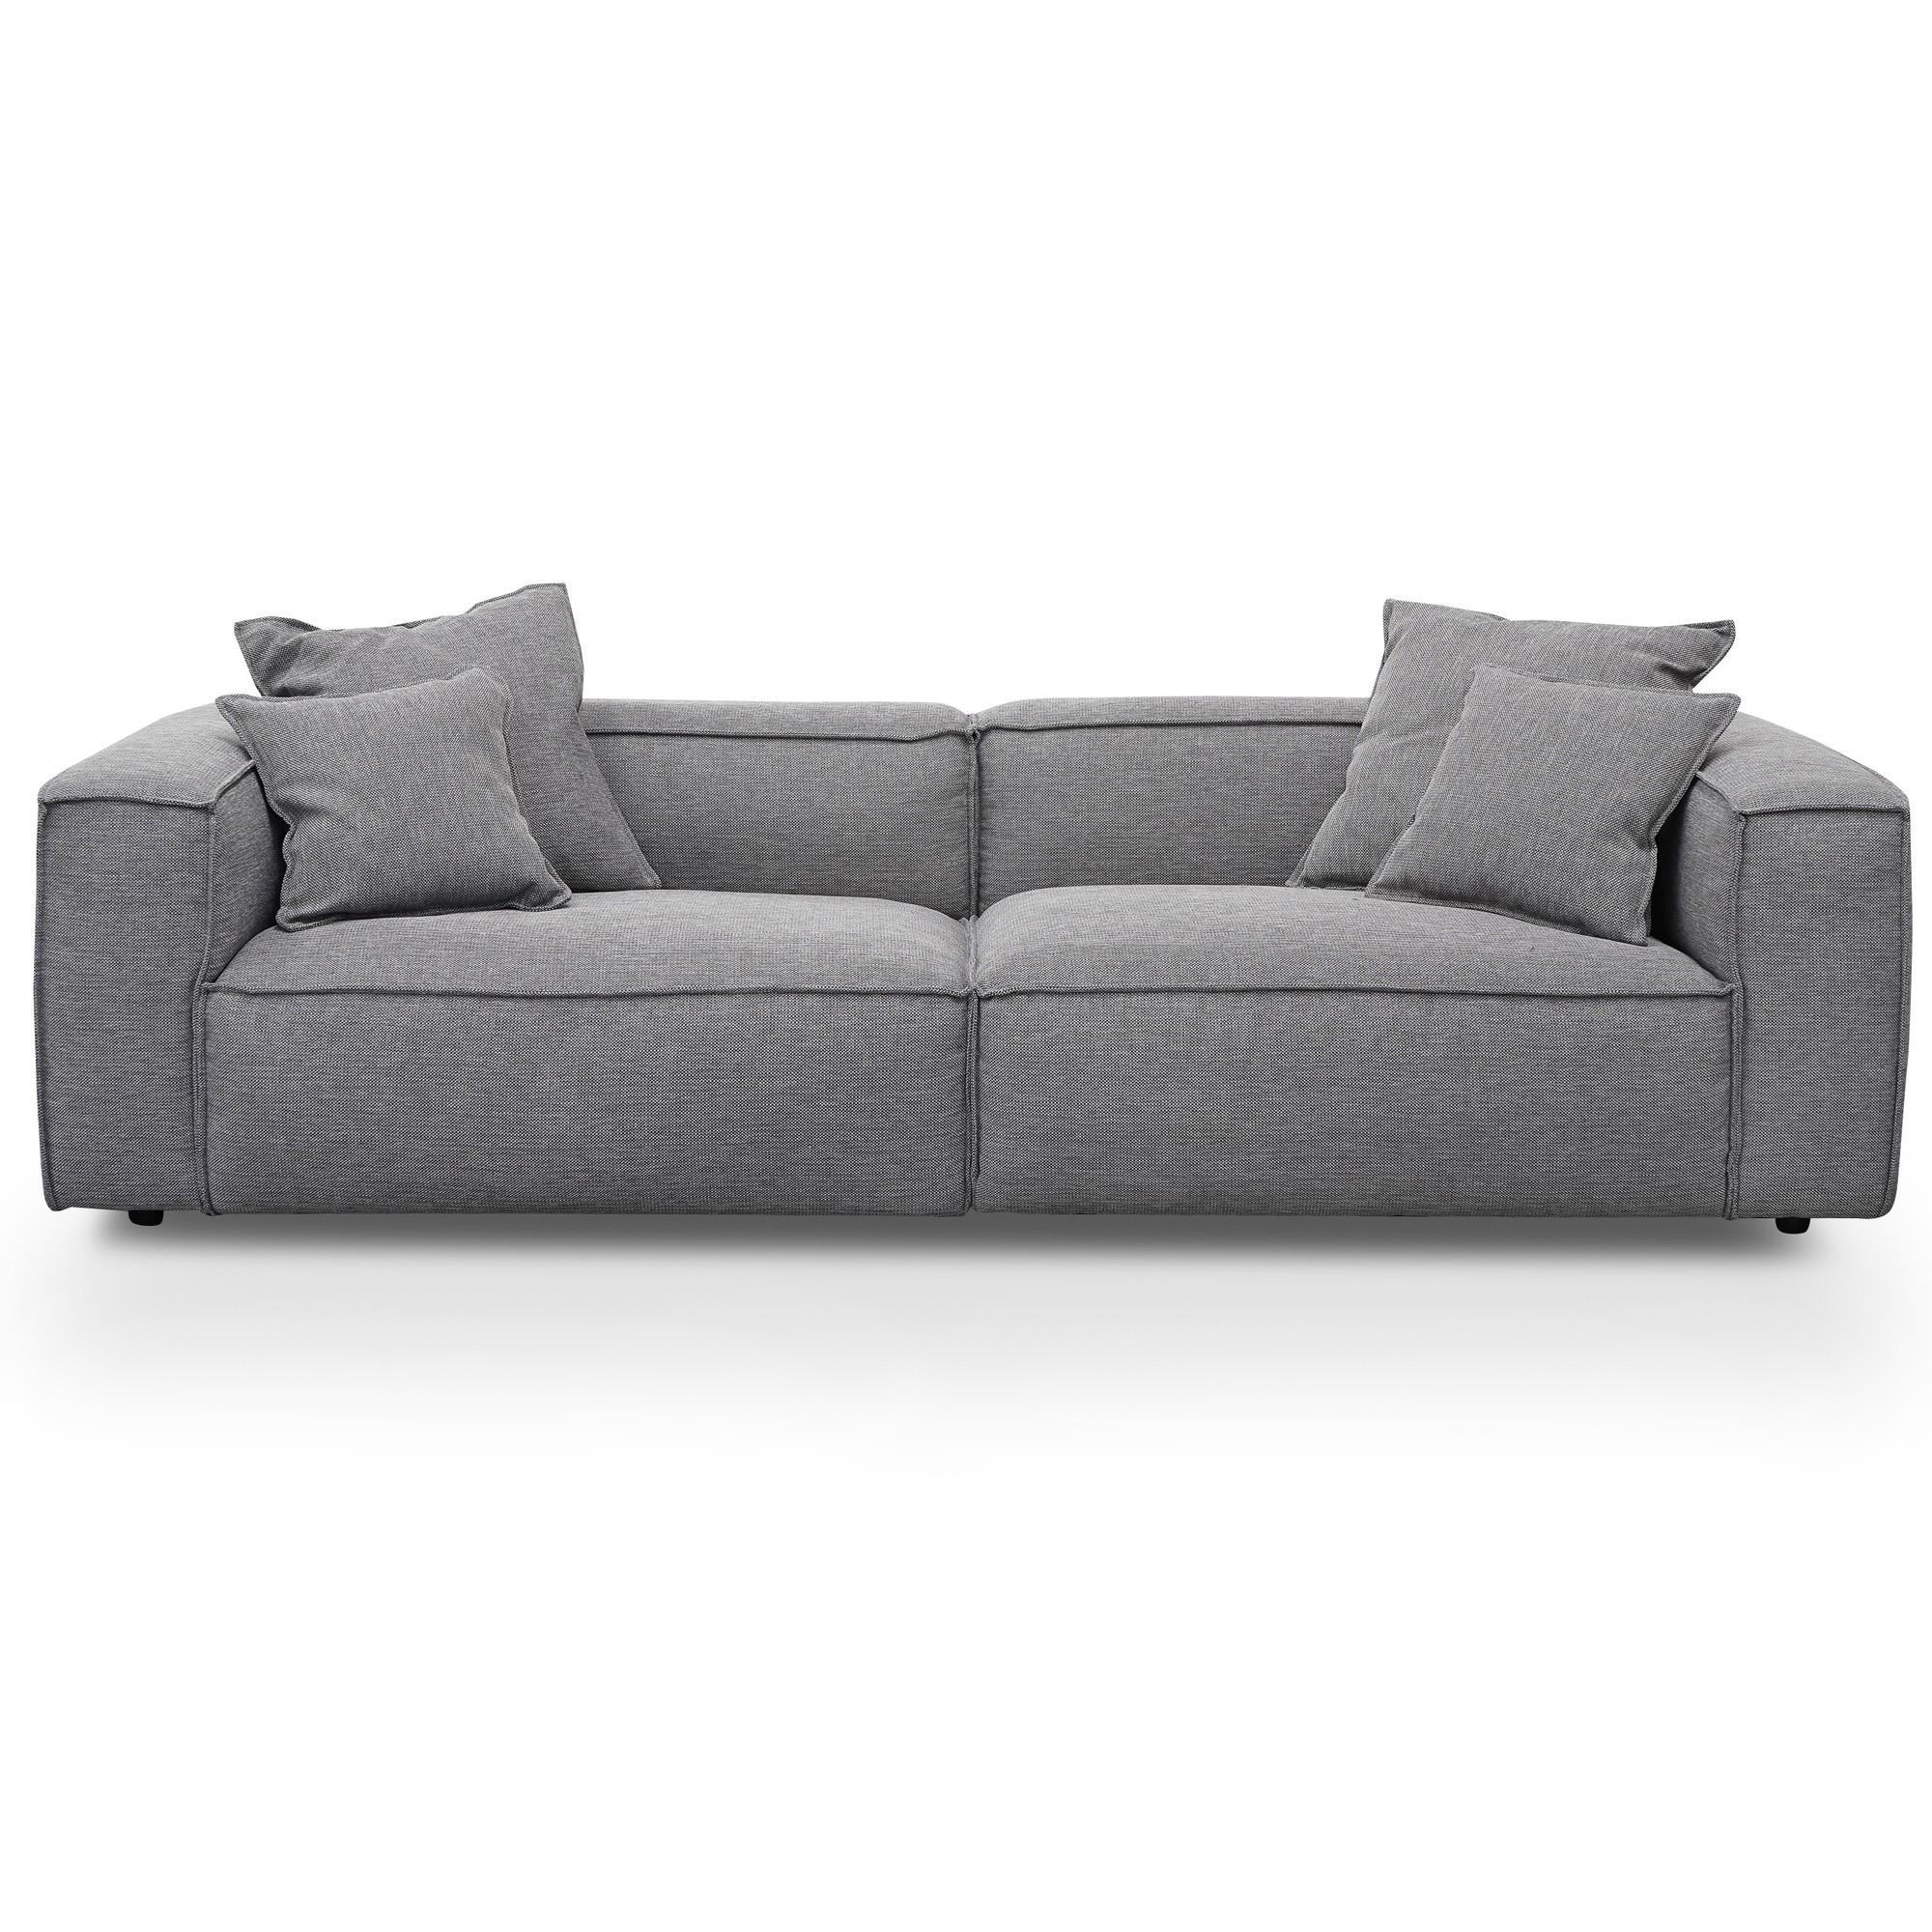 Malpas Fabric Modular Sofa, 3 Seater, Graphite Grey